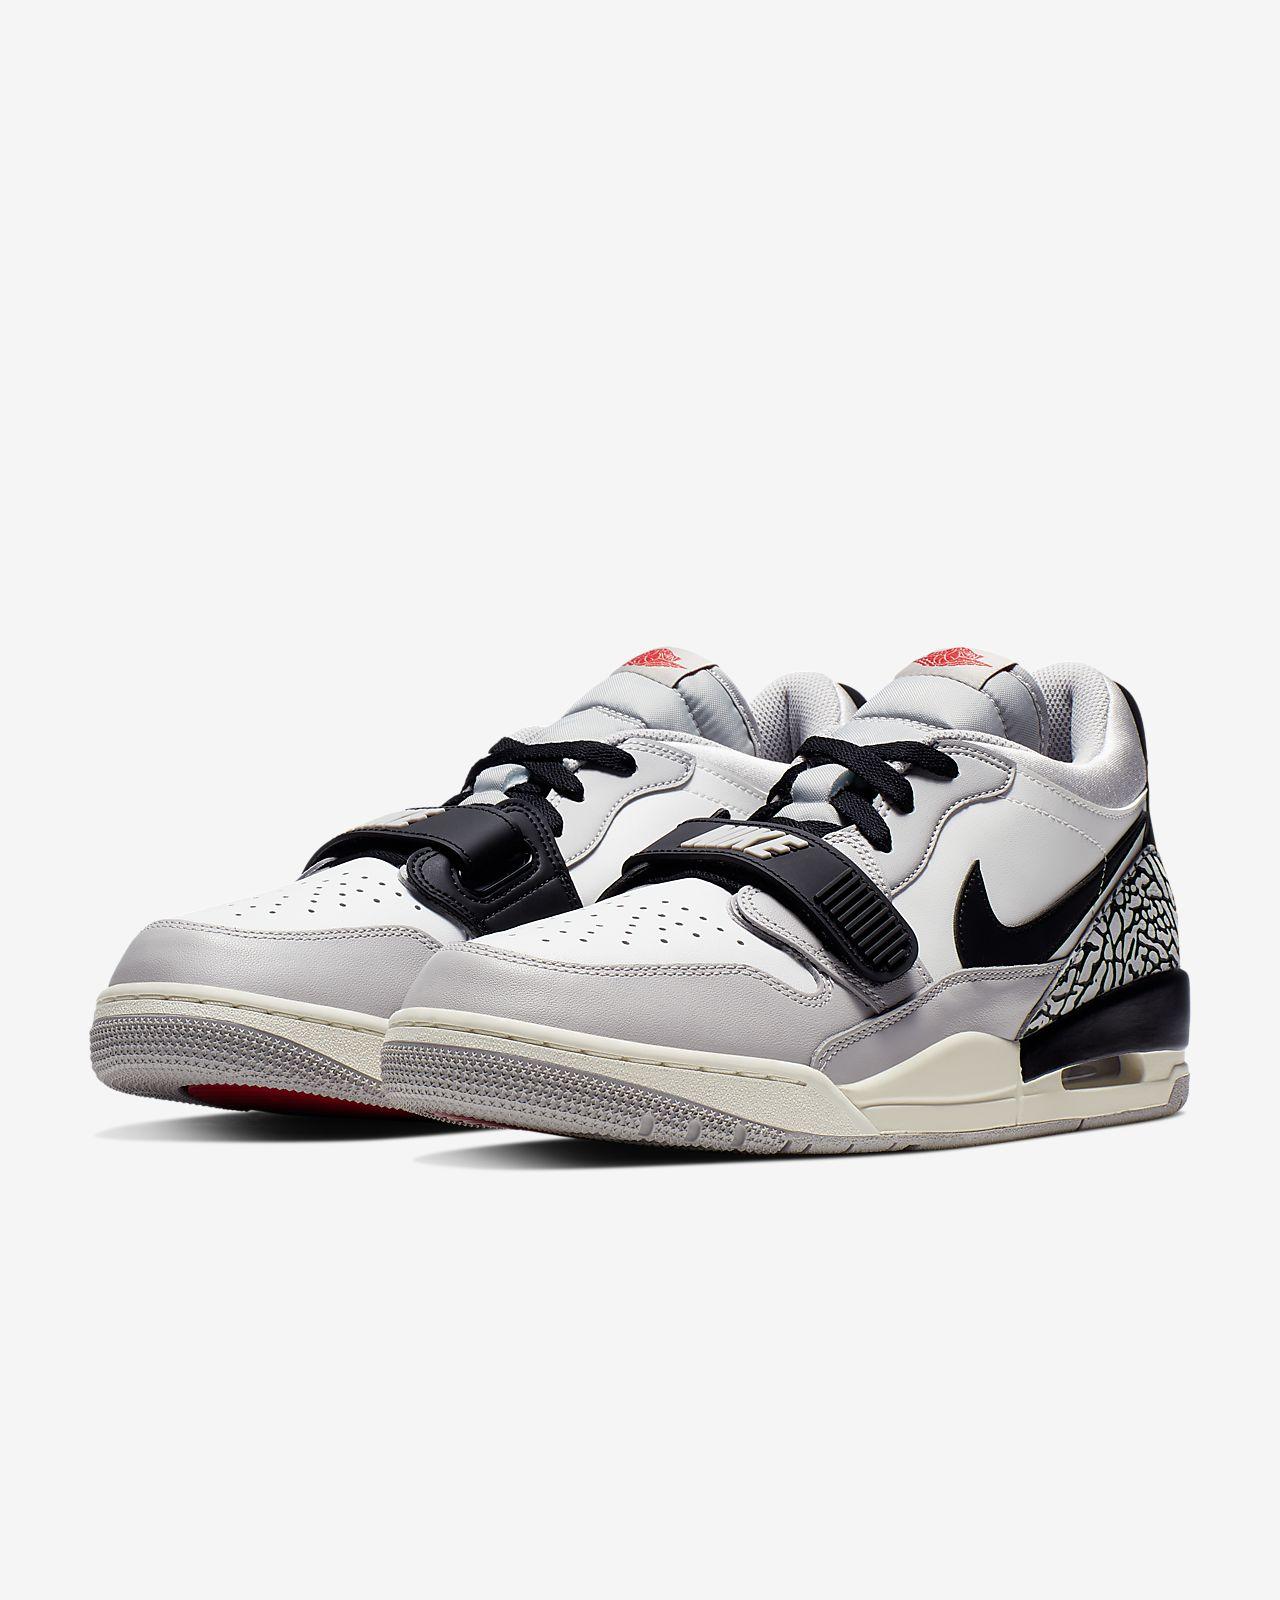 competitive price c093c 9da29 Air Jordan Legacy 312 Low Herenschoen. Nike.com BE